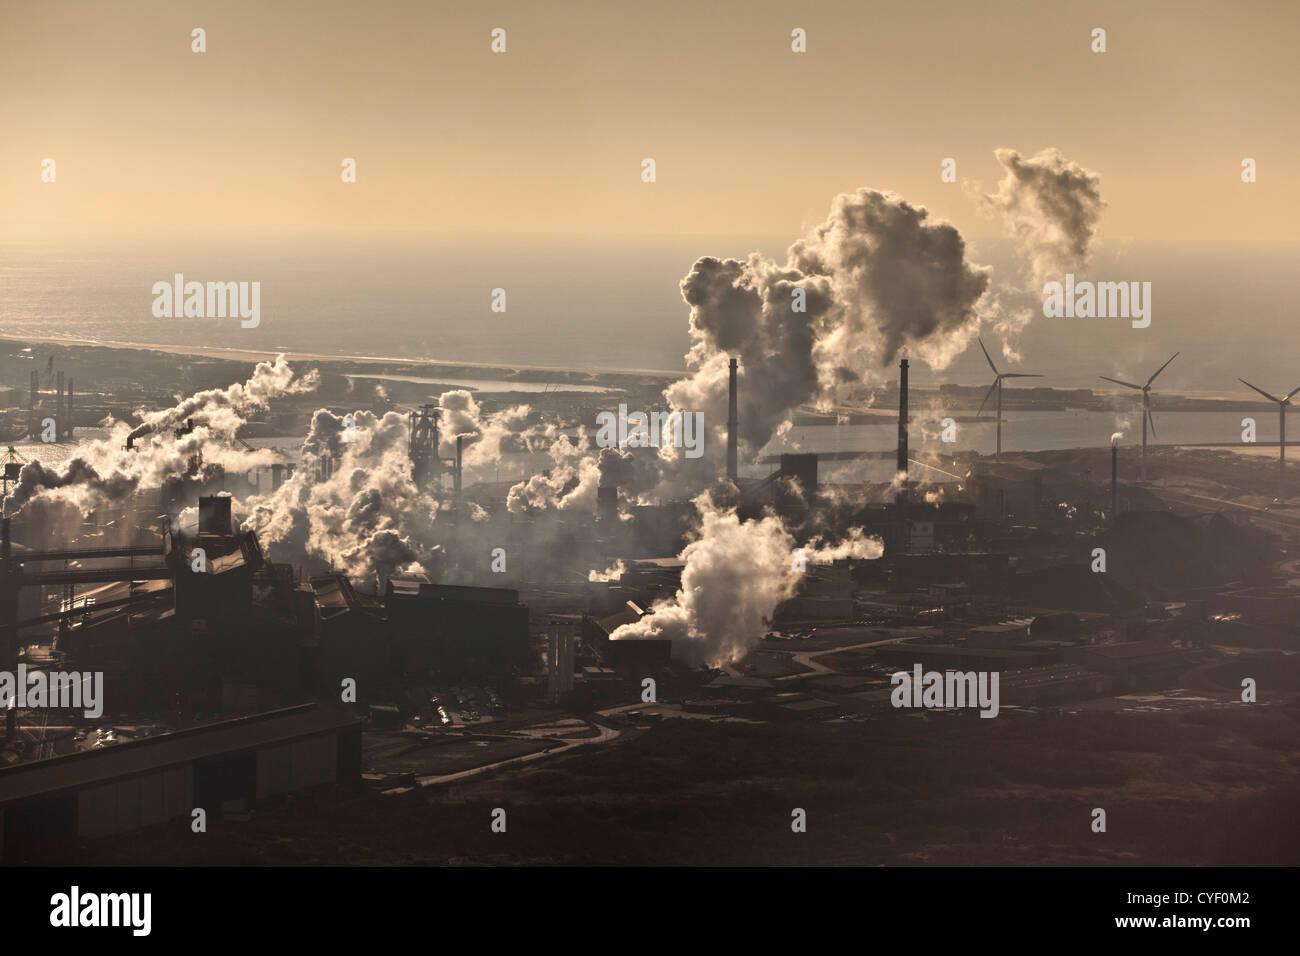 The Netherlands, Ijmuiden, TATA Steel factory. Aerial. - Stock Image